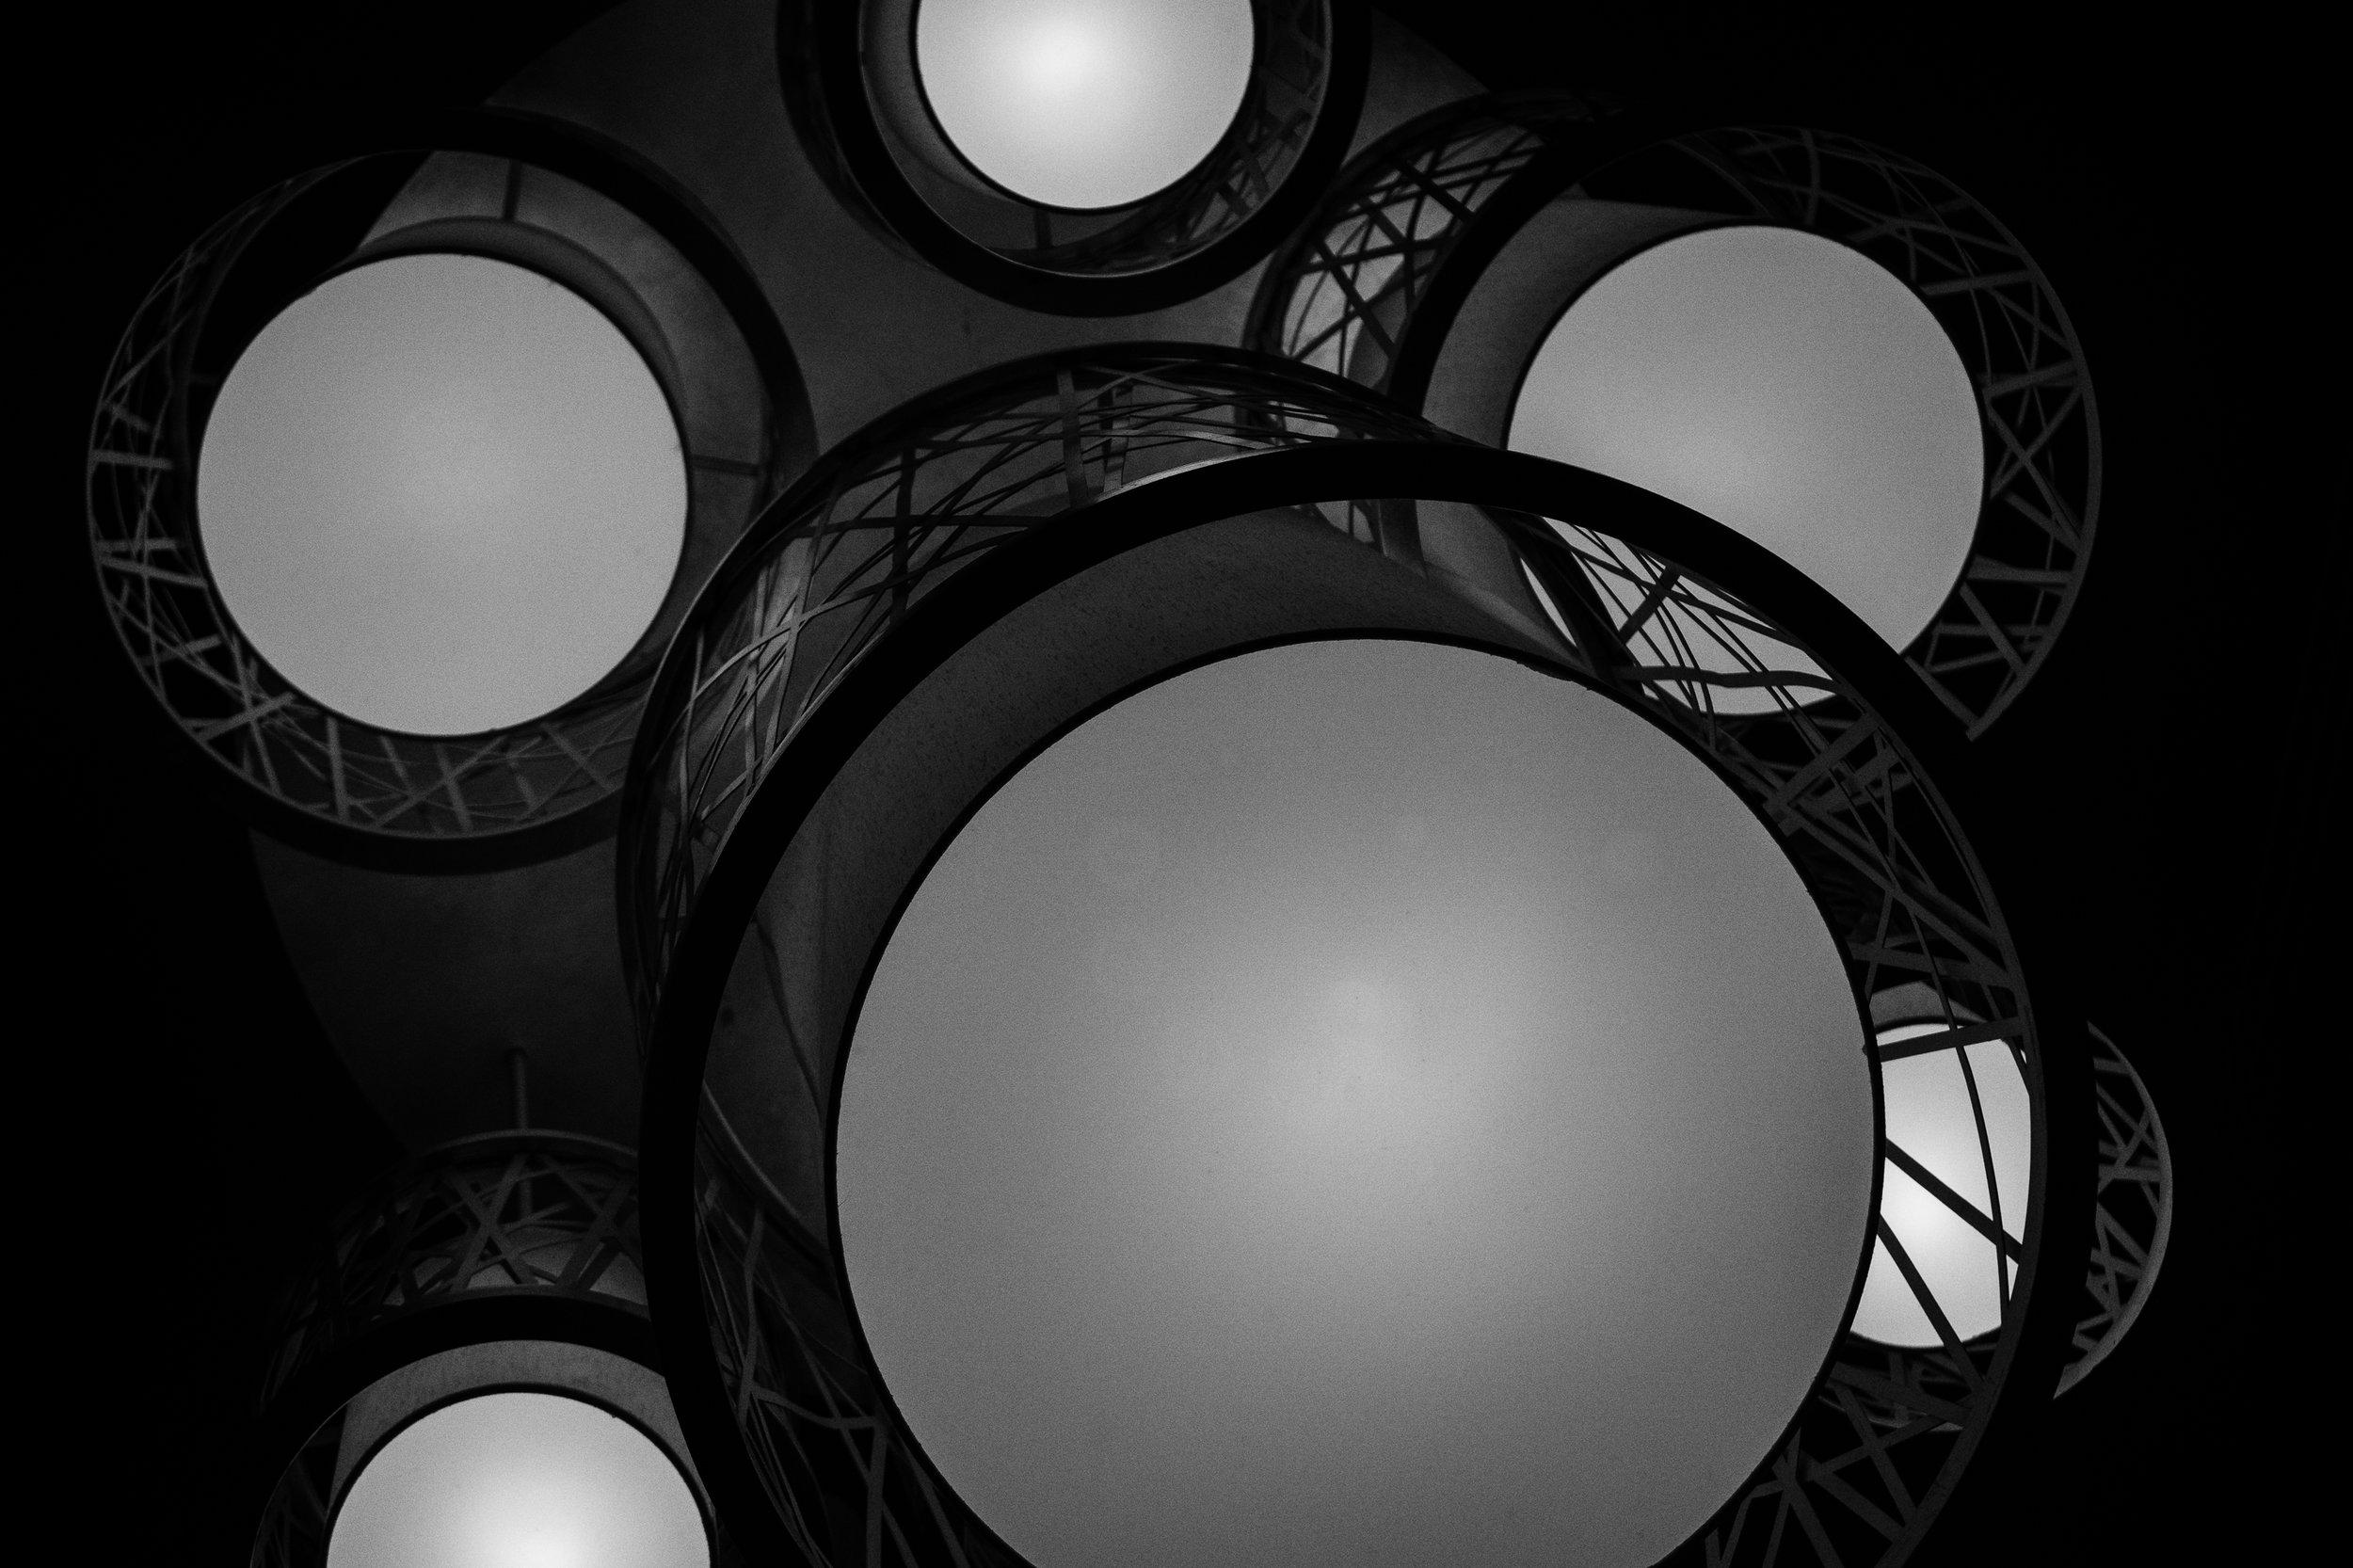 Abstract Light Fixtures